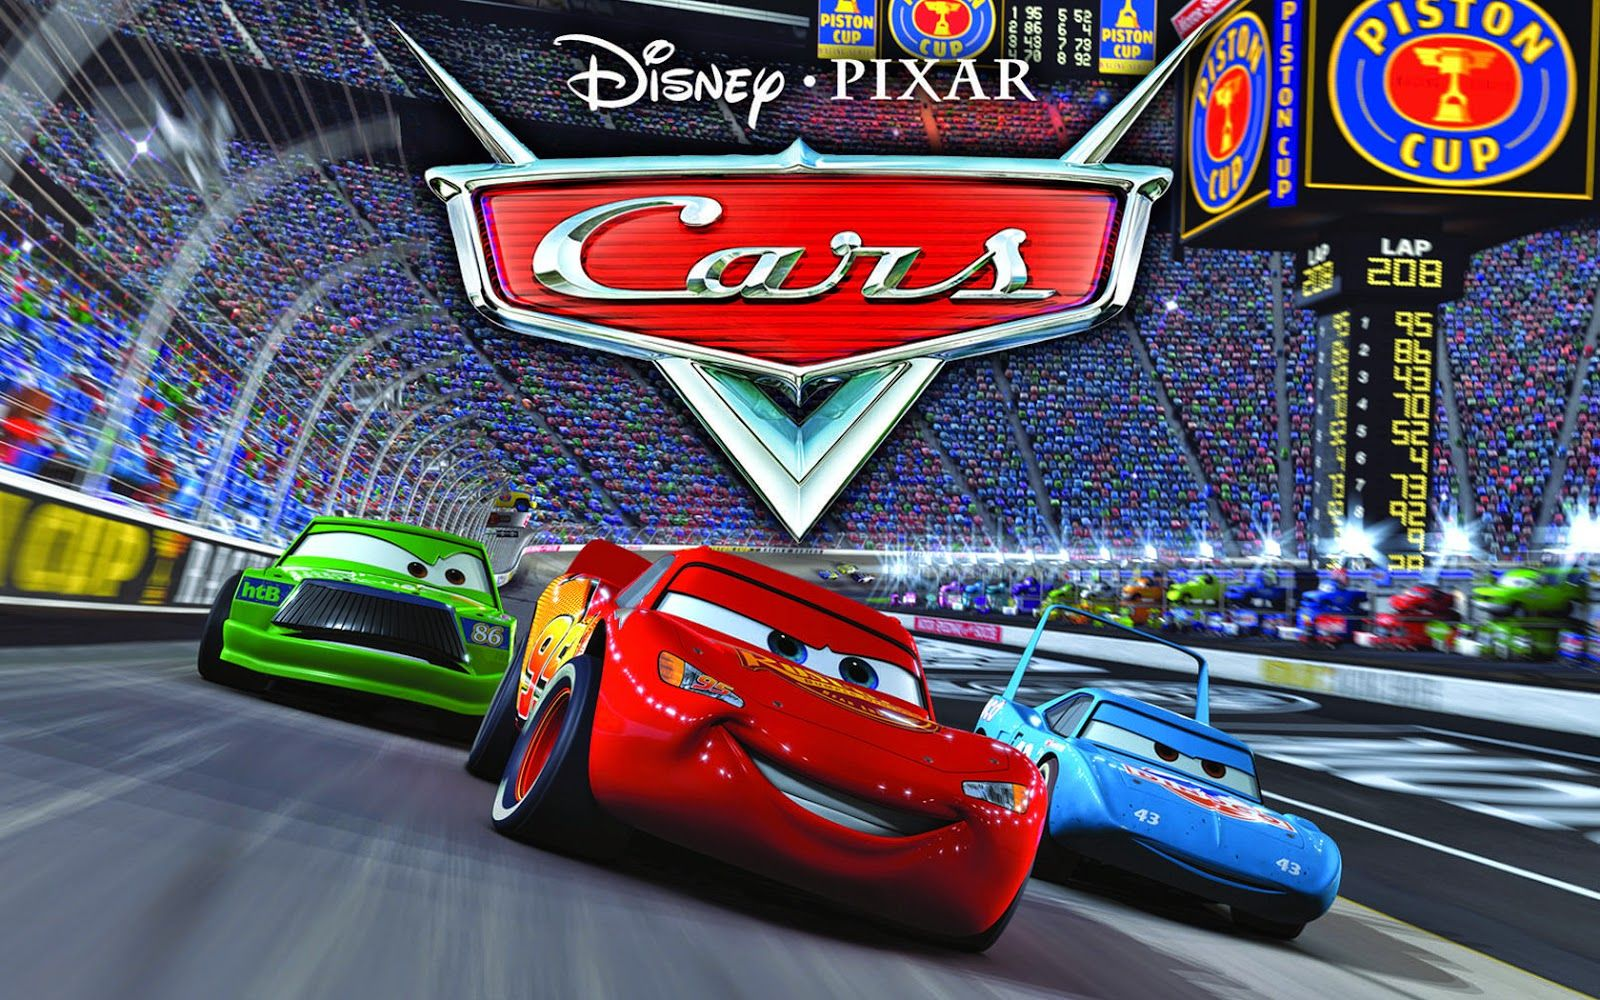 Disney S Cars 2 Wallpaper Disney Cars Wallpaper Disney Cars